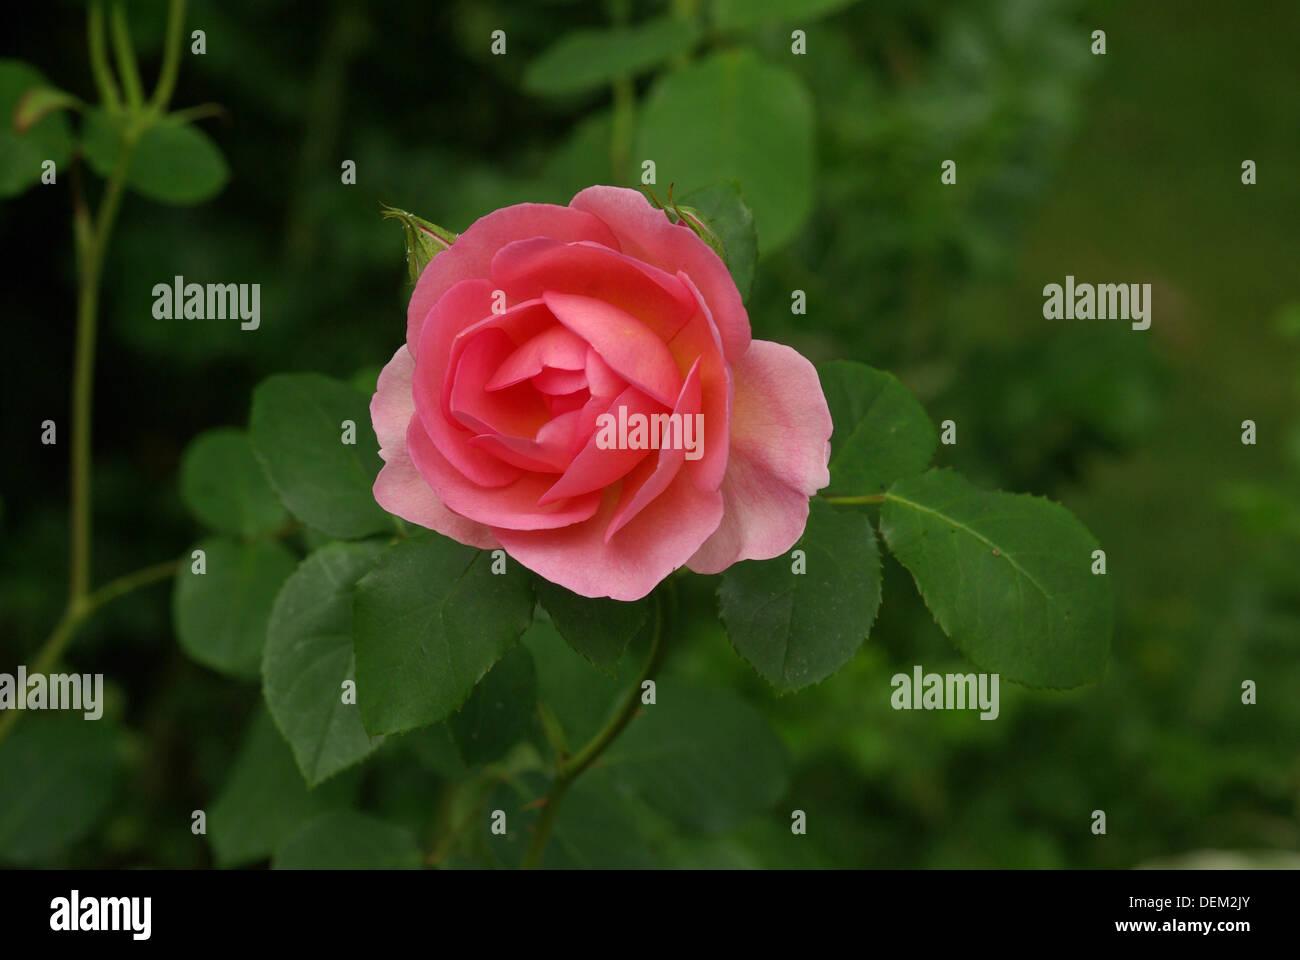 Rosa shrub  -  HERO - Stock Image